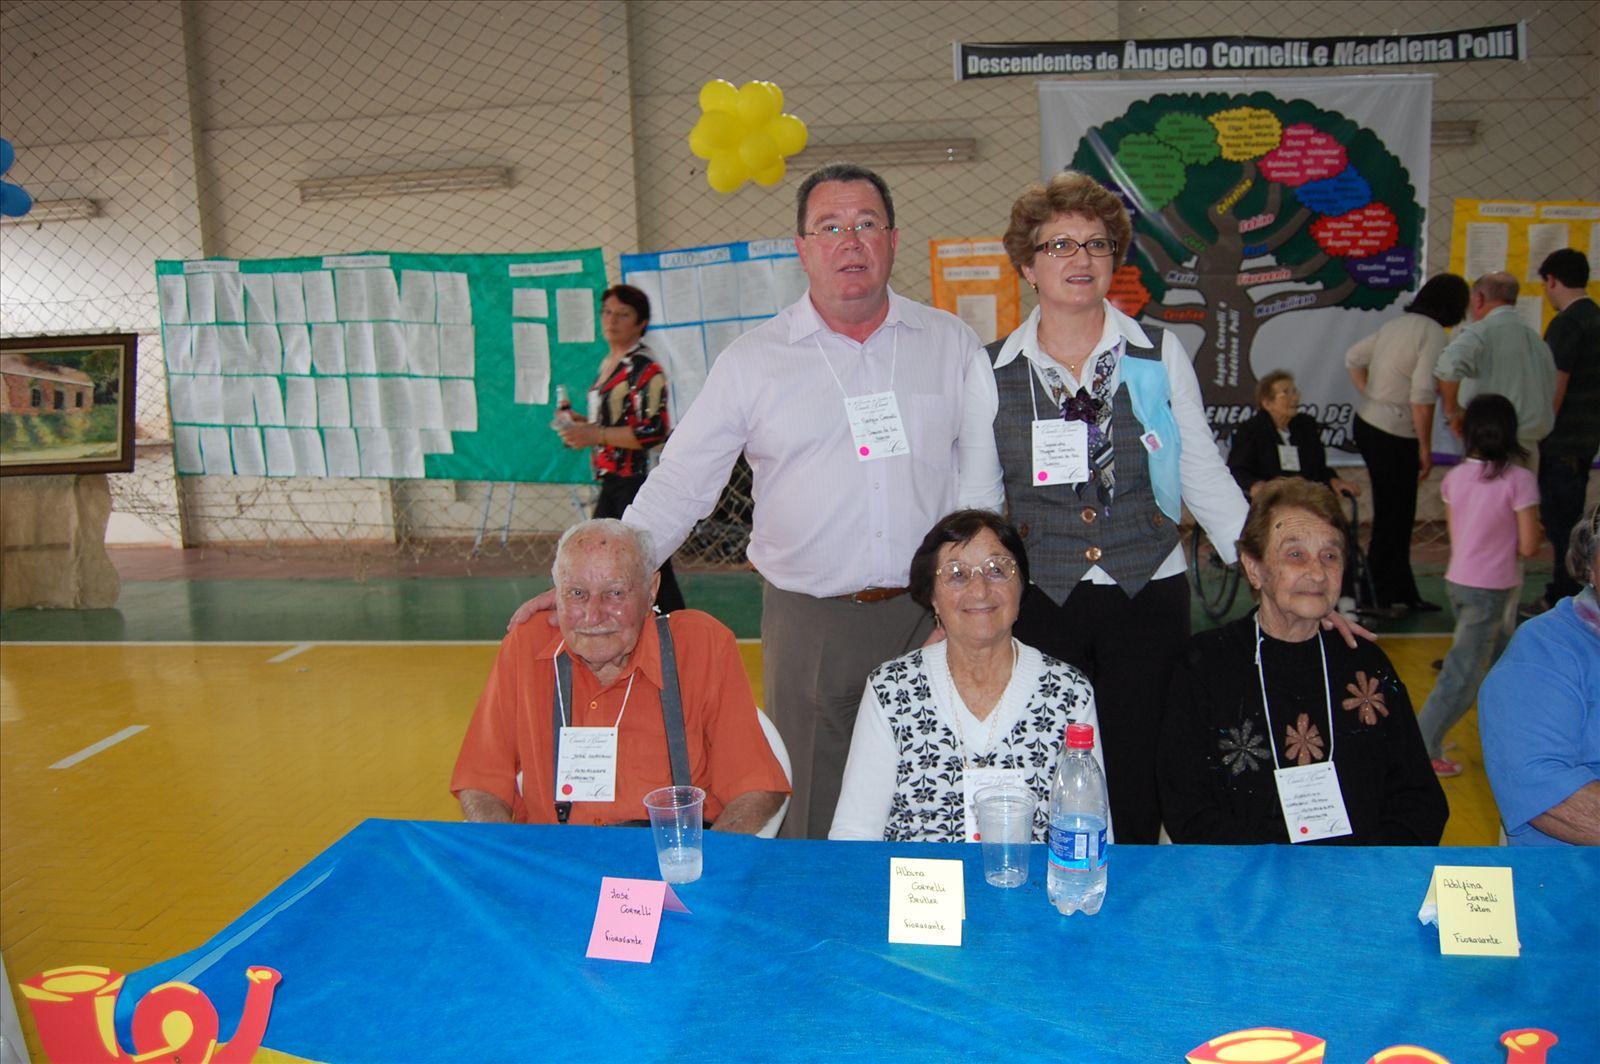 2º Encontro Família Cornelli - 11.10.2009 (211)_0